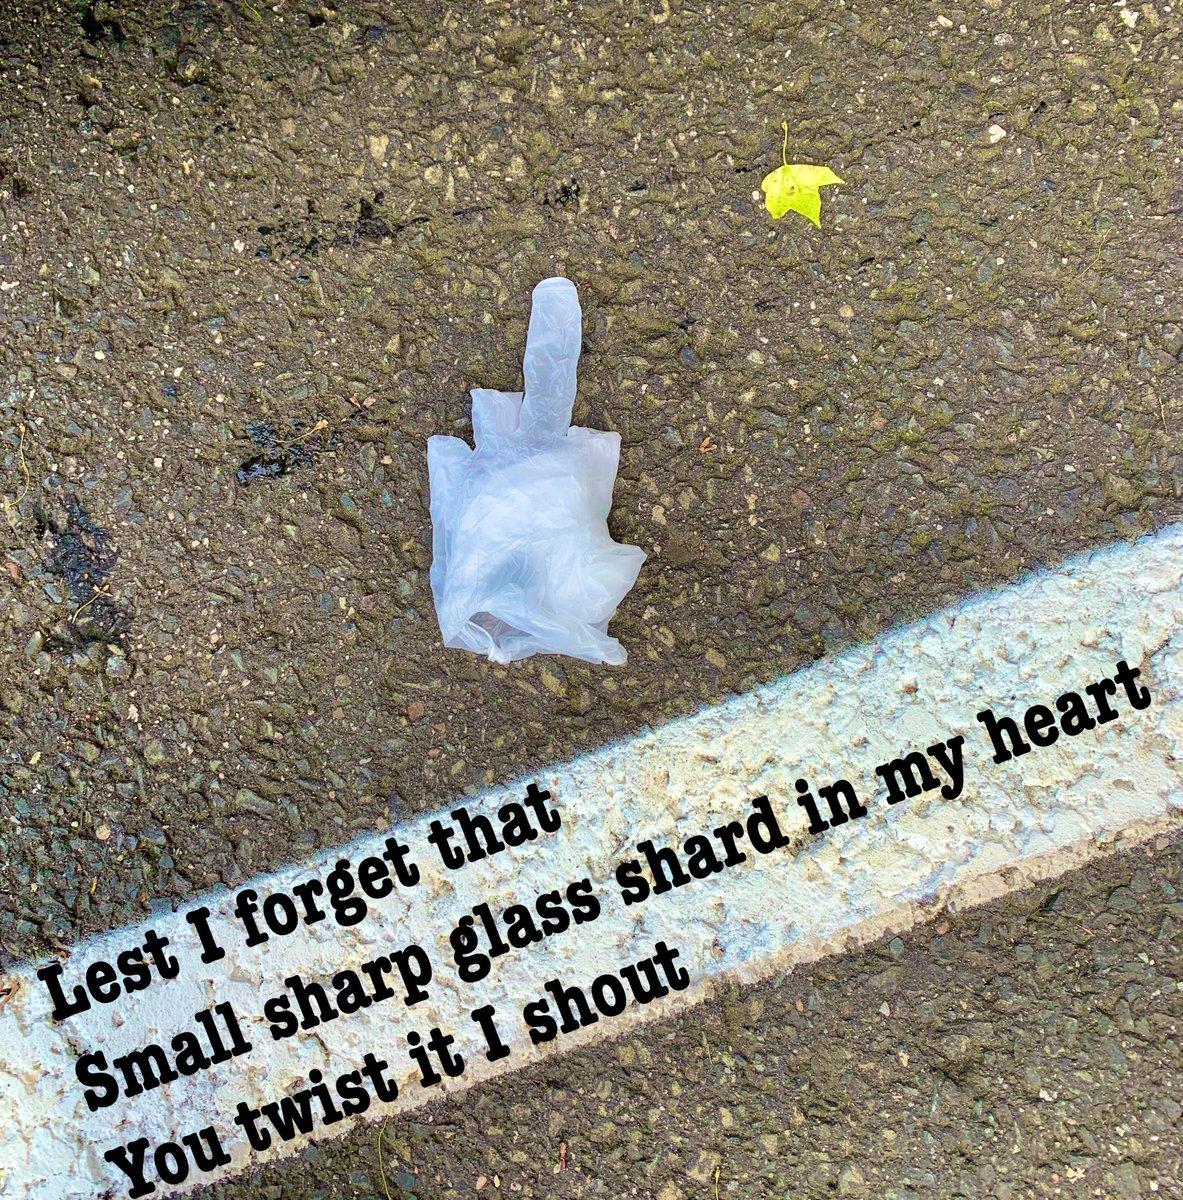 #haiku #poem #poetry #sharp #shard #glass #heart #shout #twist #twistandshout